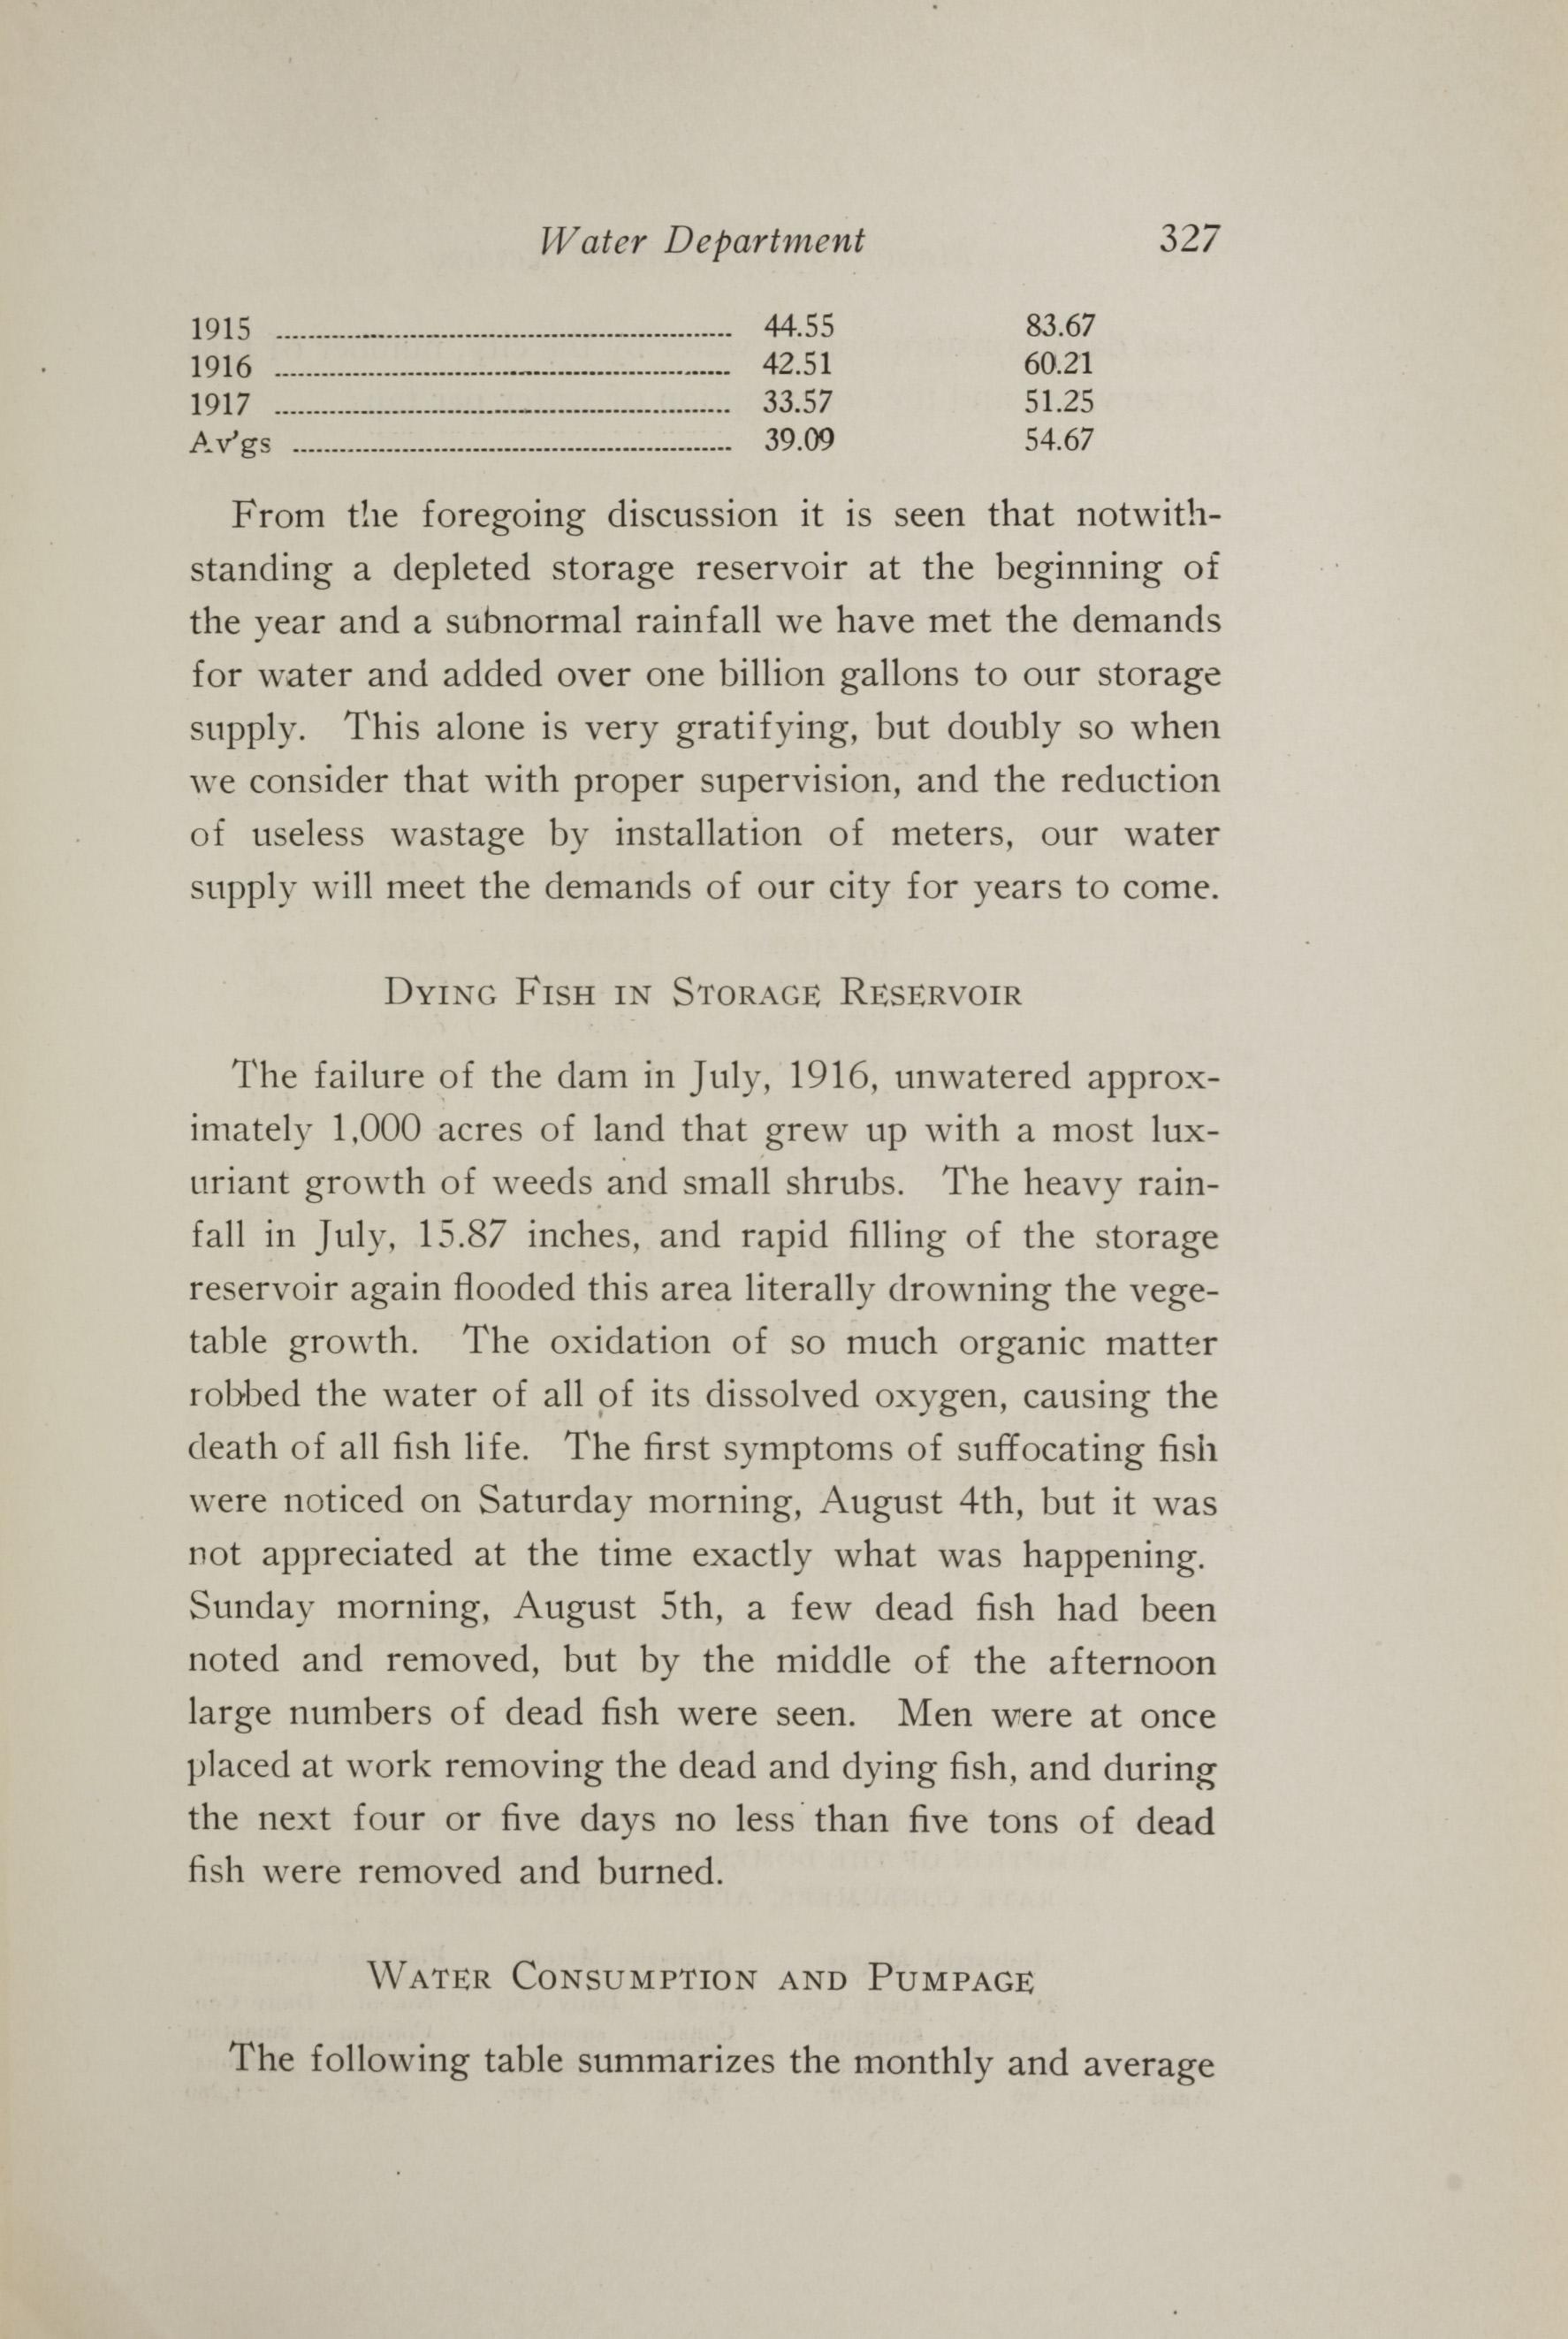 Charleston Yearbook, 1917, page 327